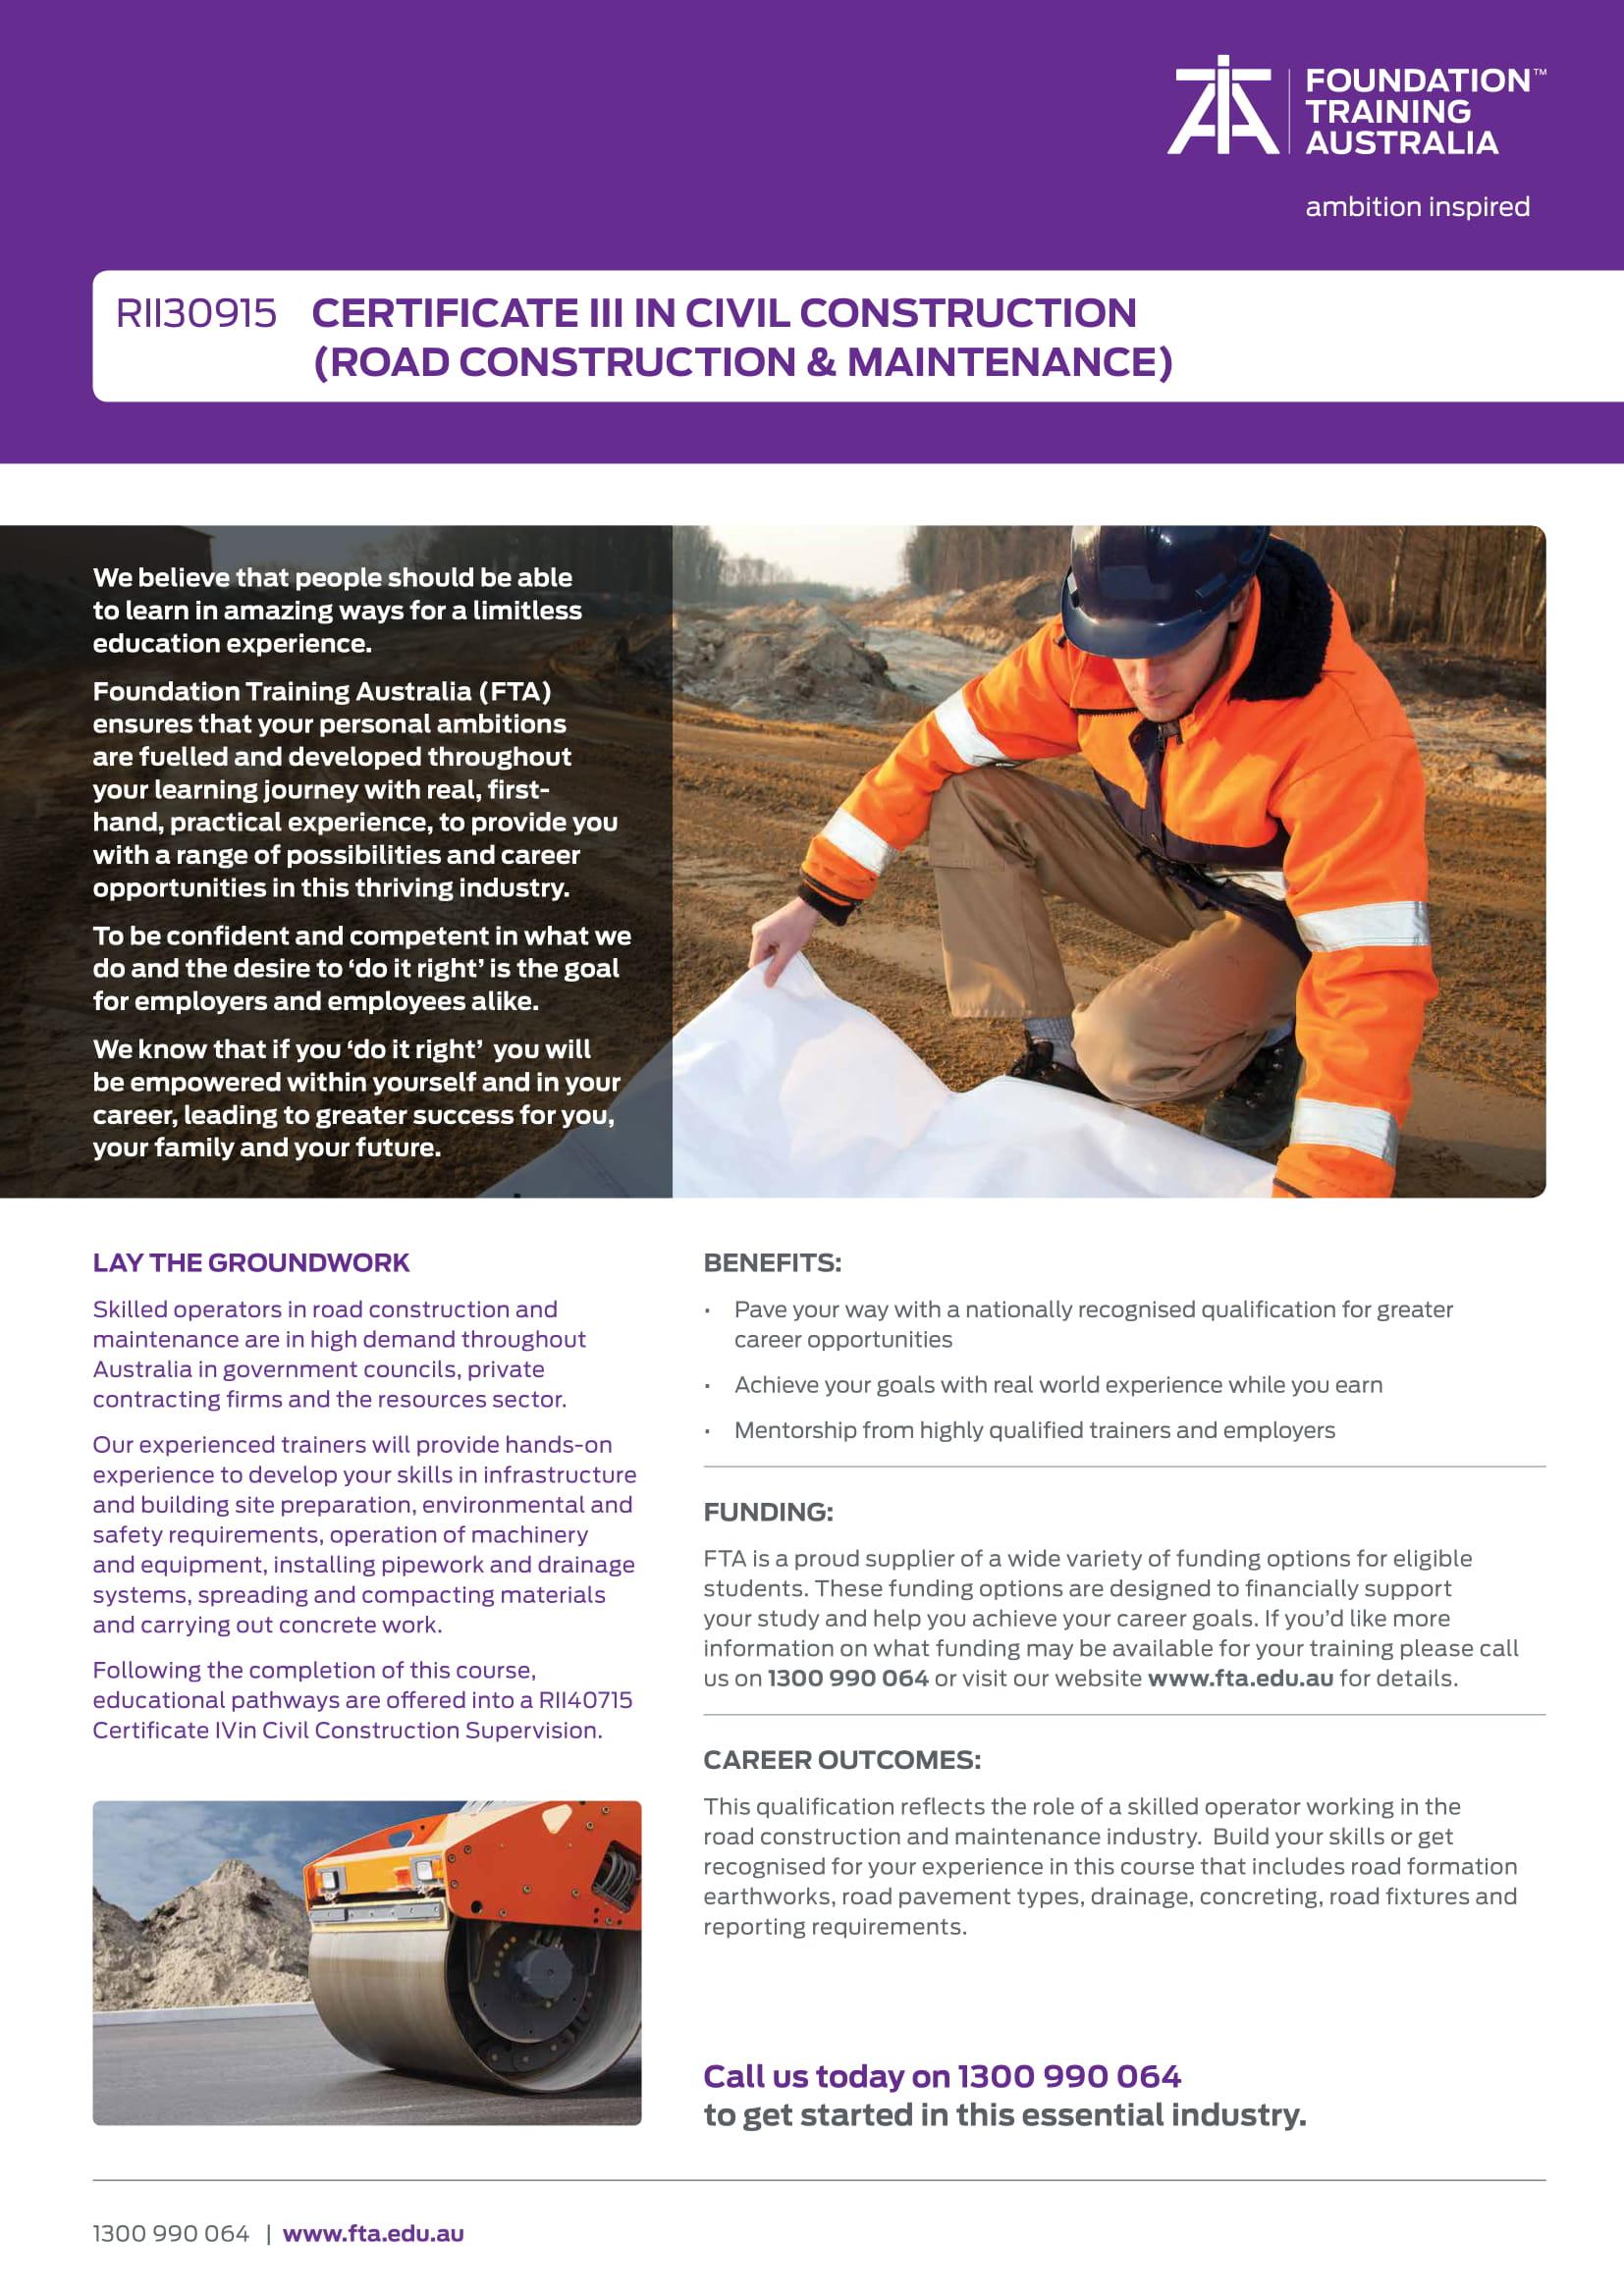 https://www.fta.edu.au/wp-content/uploads/2020/06/TP1.MK_.008-Civil-Construction-RCM-Course-Flyer-RII30915-V3-_-June-18-DIGITAL-1-1.jpg